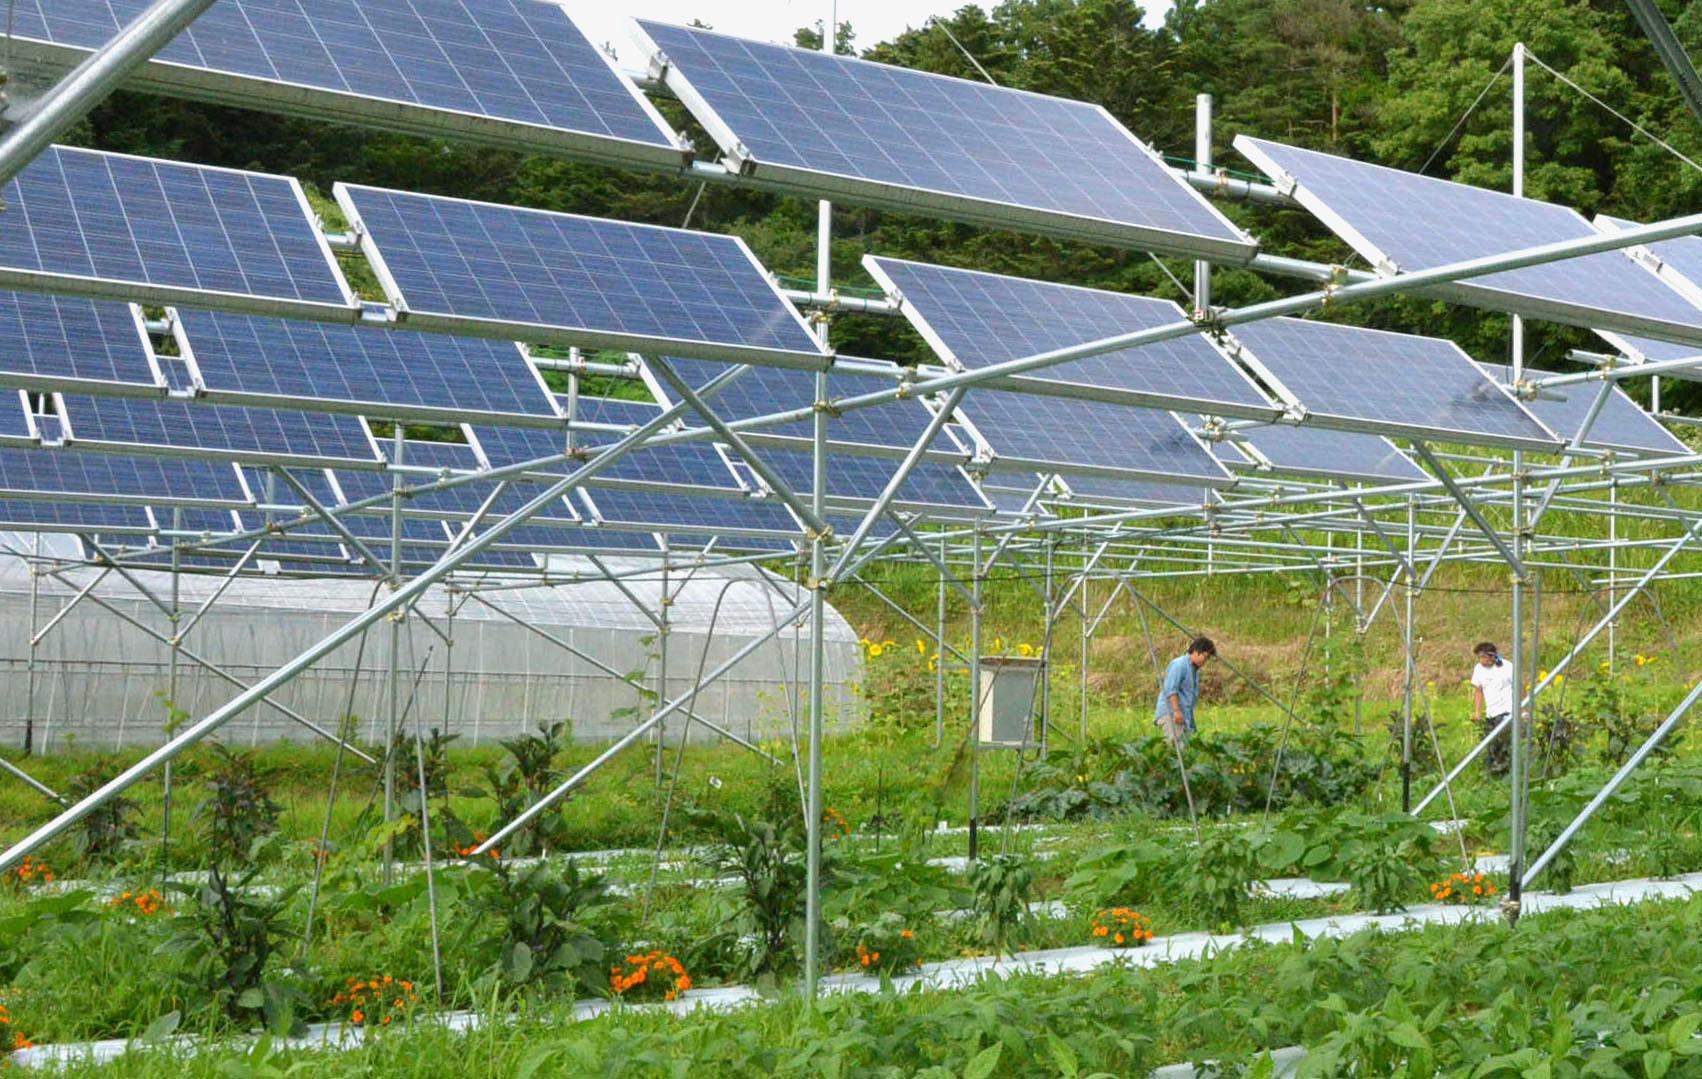 Solar Financier Loanpal Plans IPO as Soon as This Year